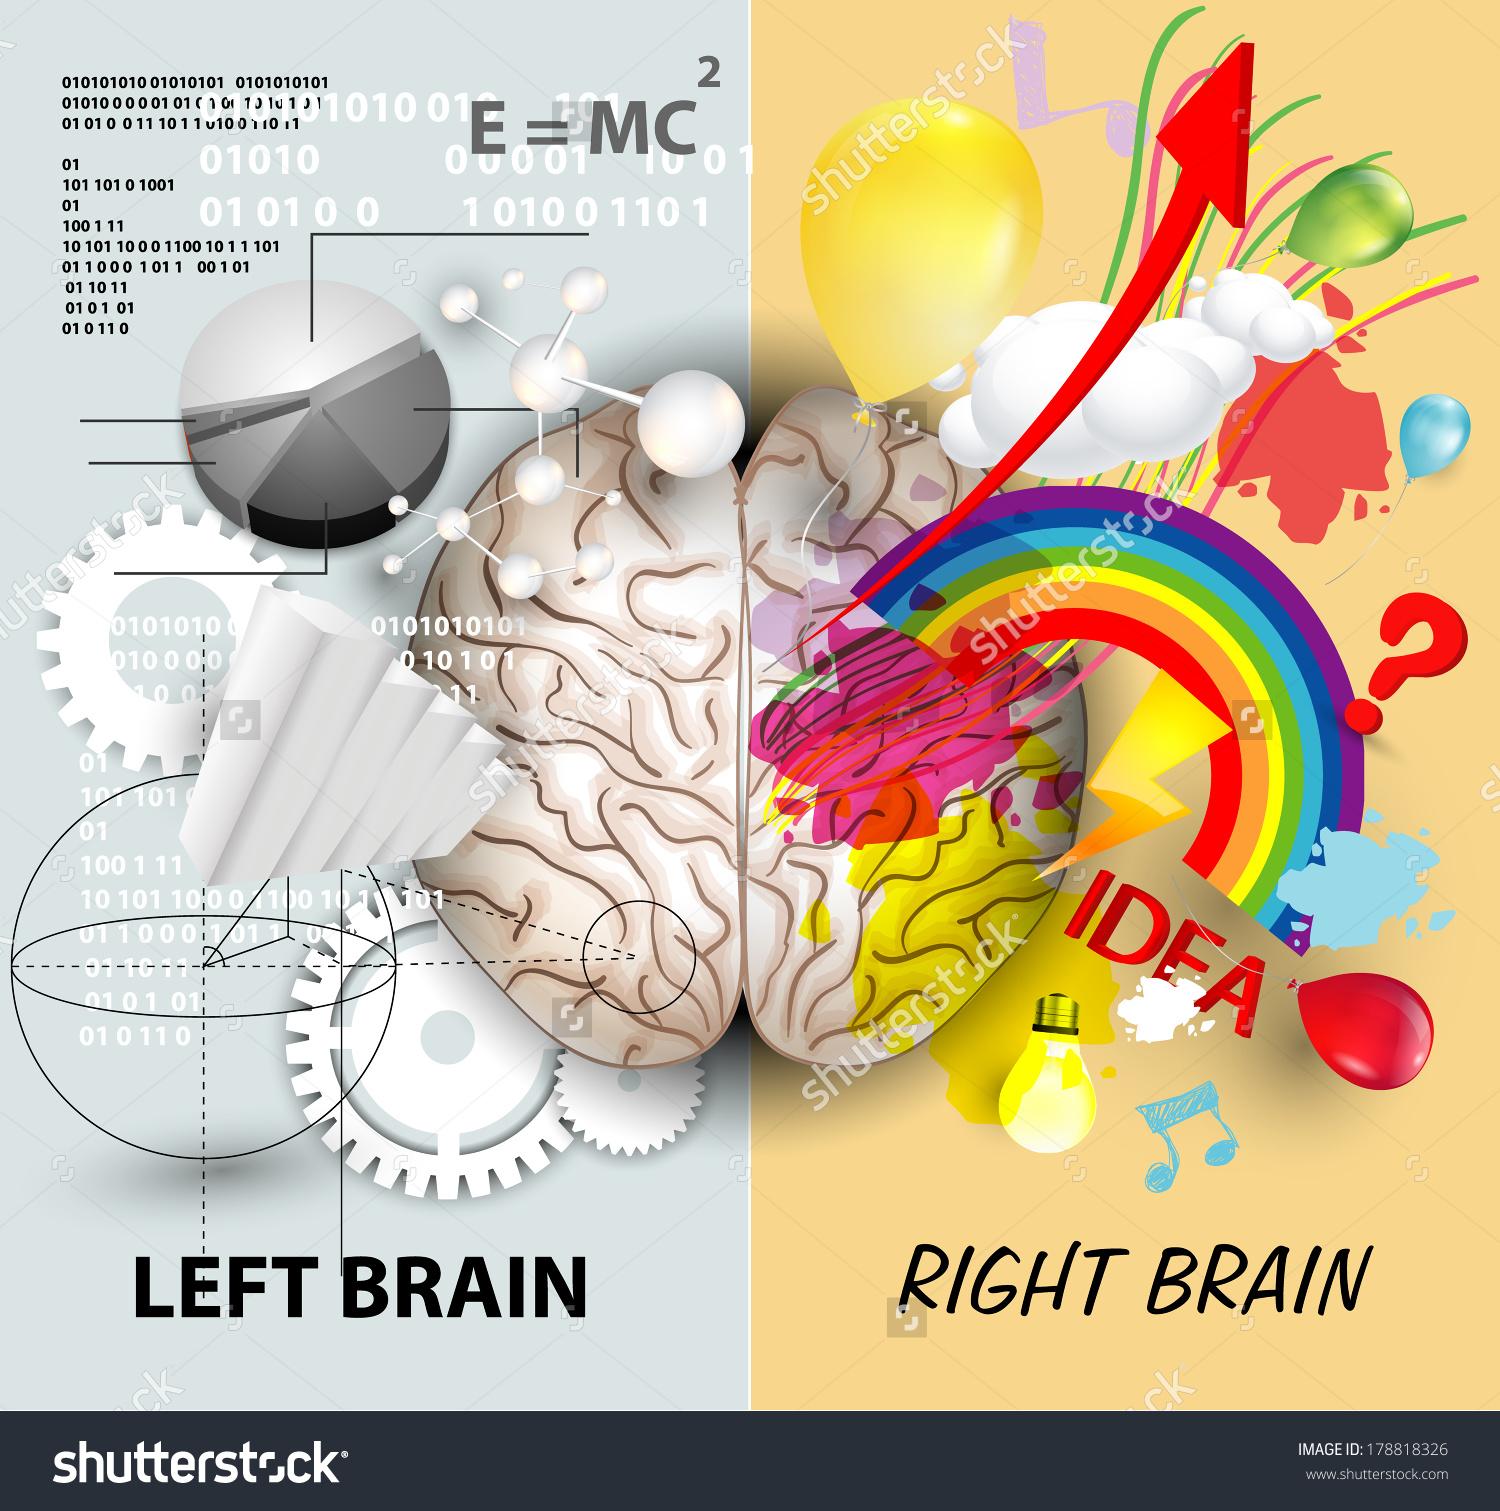 Drawn brain right brain #12